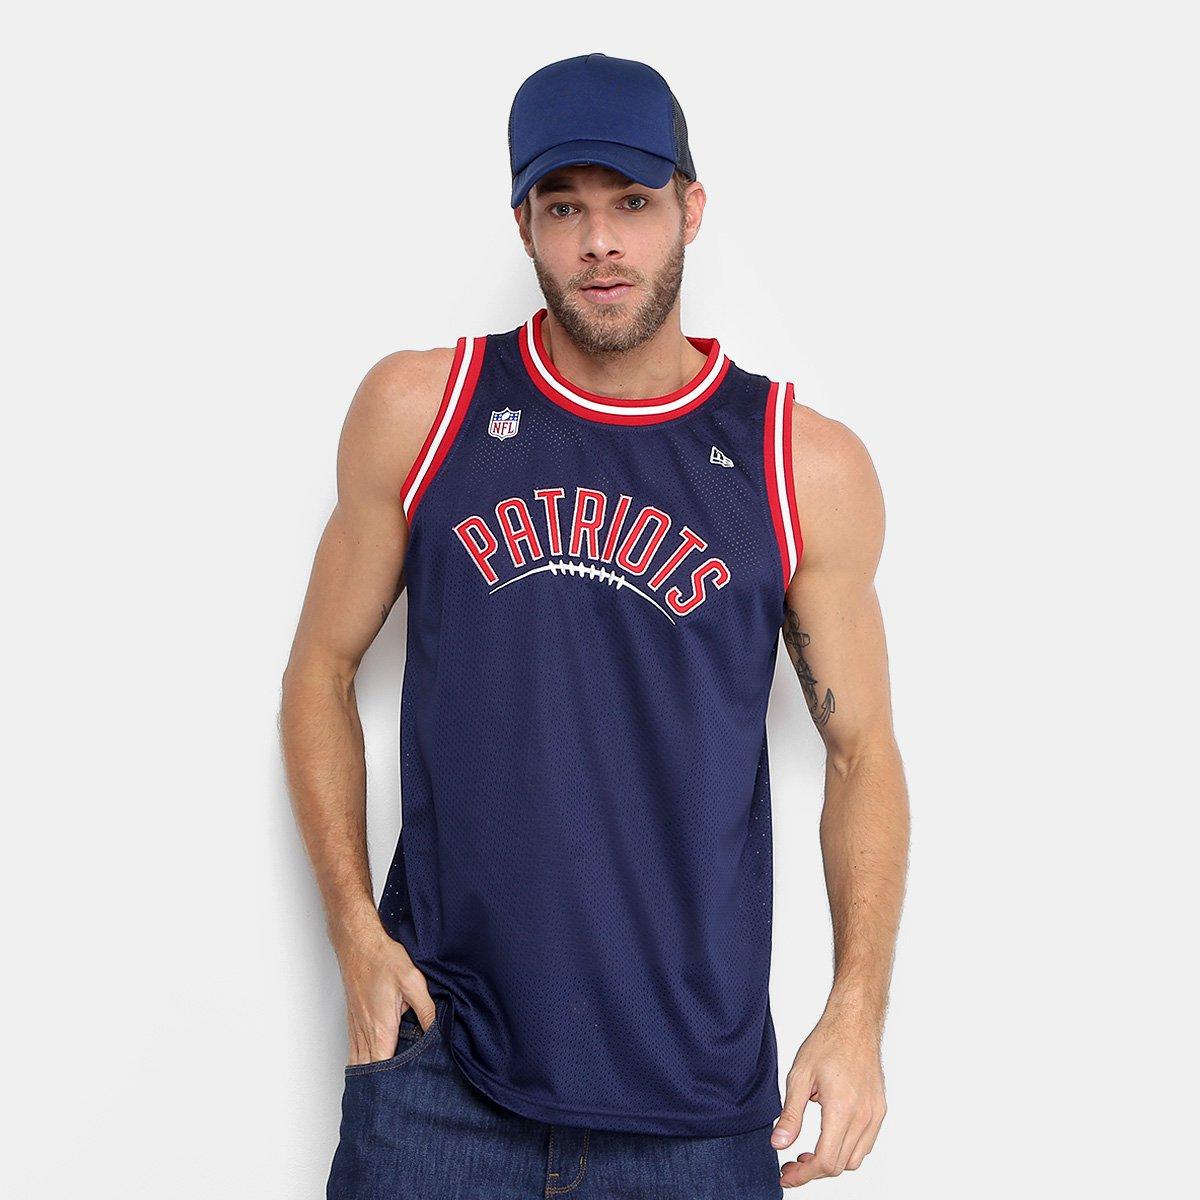 Regata NFL New England Patriots New Era Sports Vein Neepat Masculina -  Marinho - Compre Agora  84c8c7797f1bd